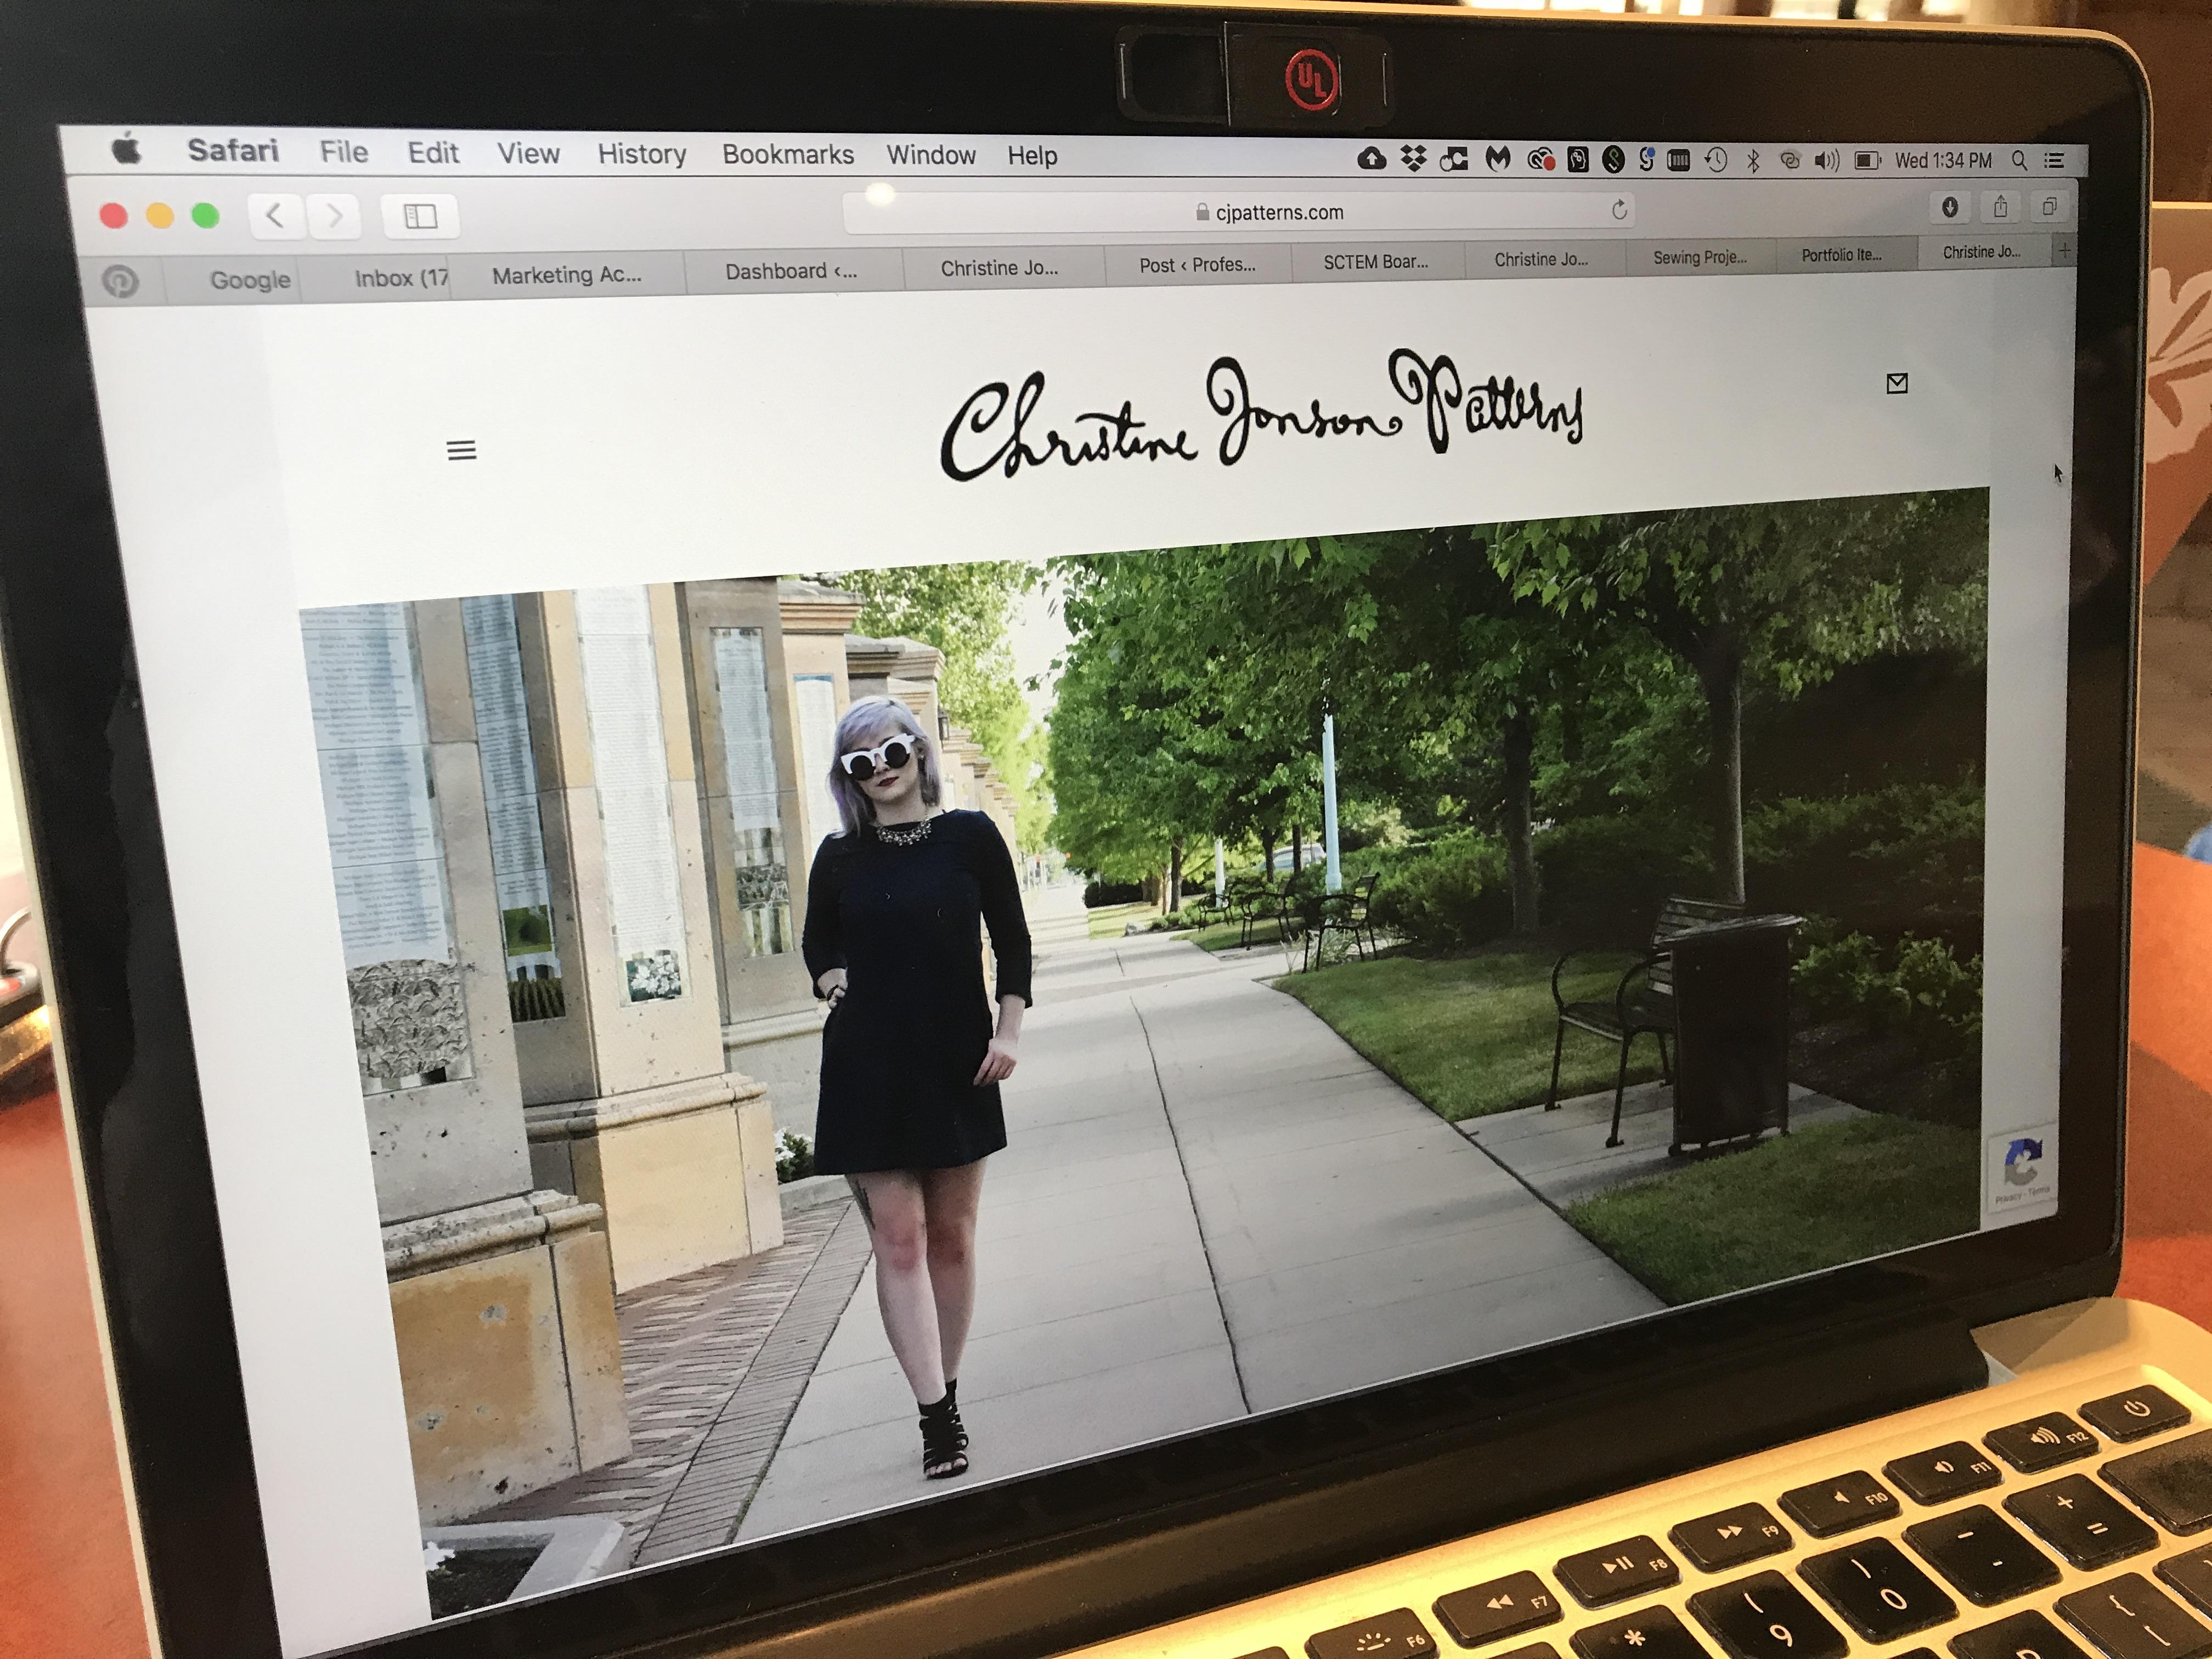 Sewing pattern web site design & development